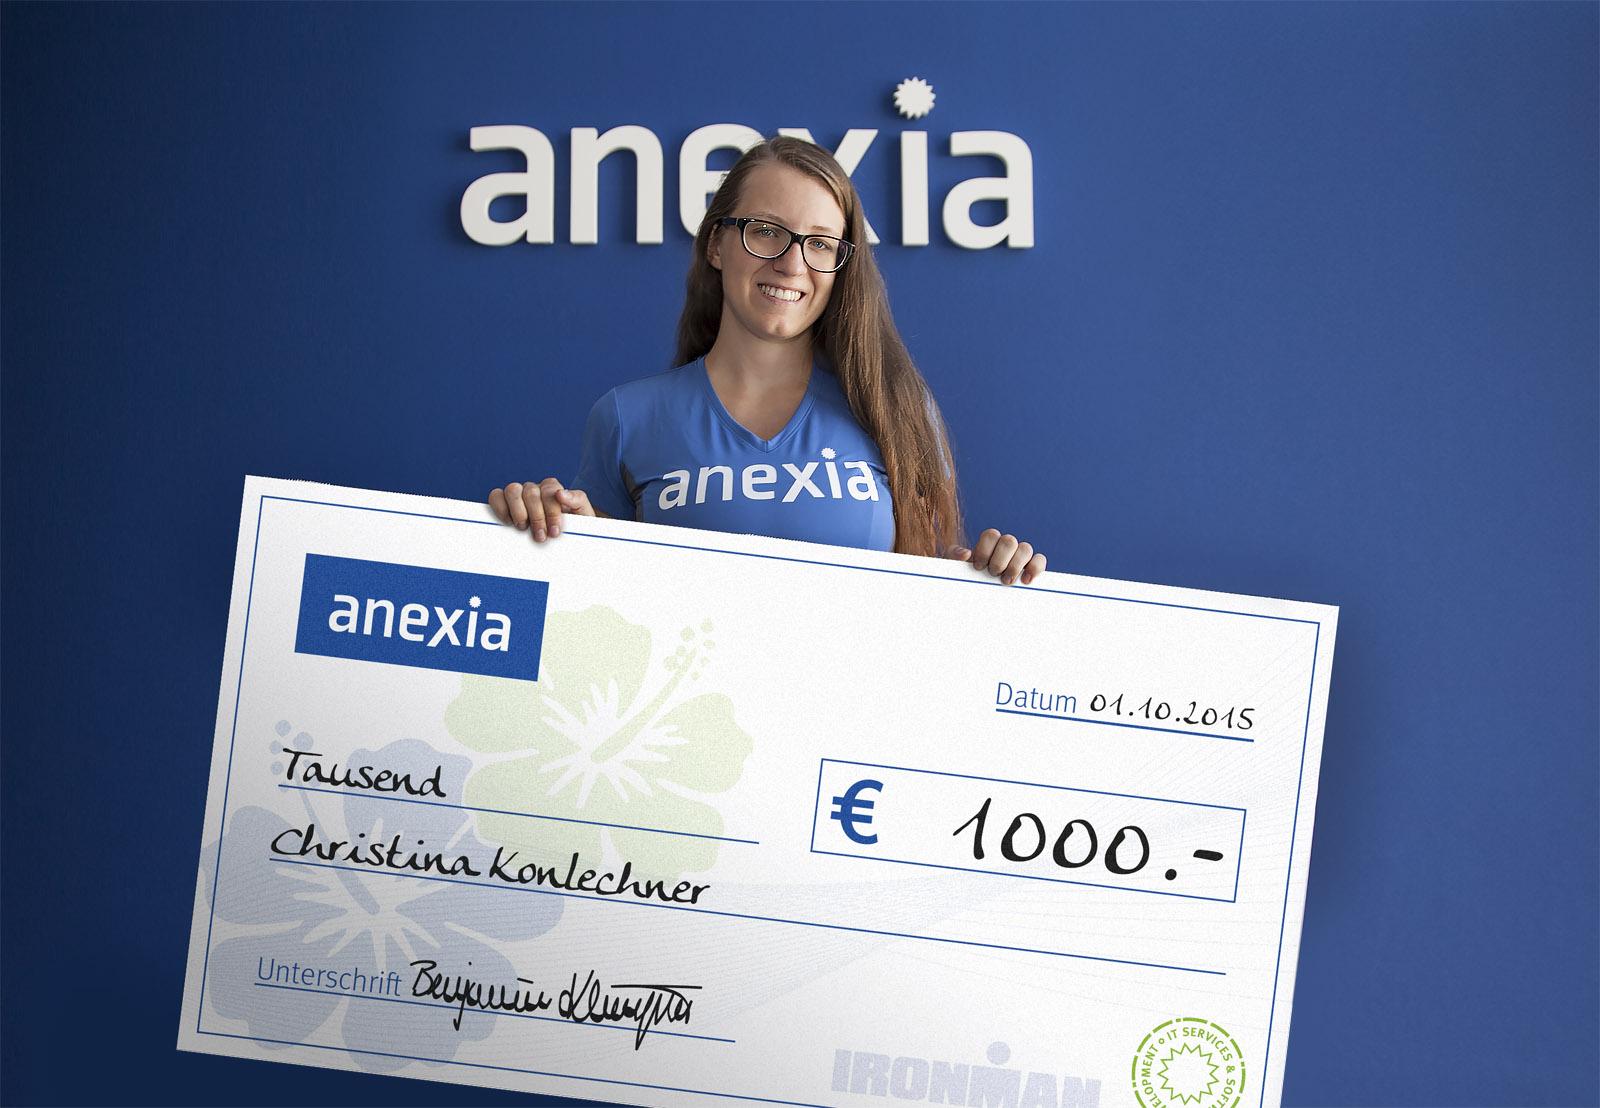 Kronlechner-ANEXIA-Sponsoring